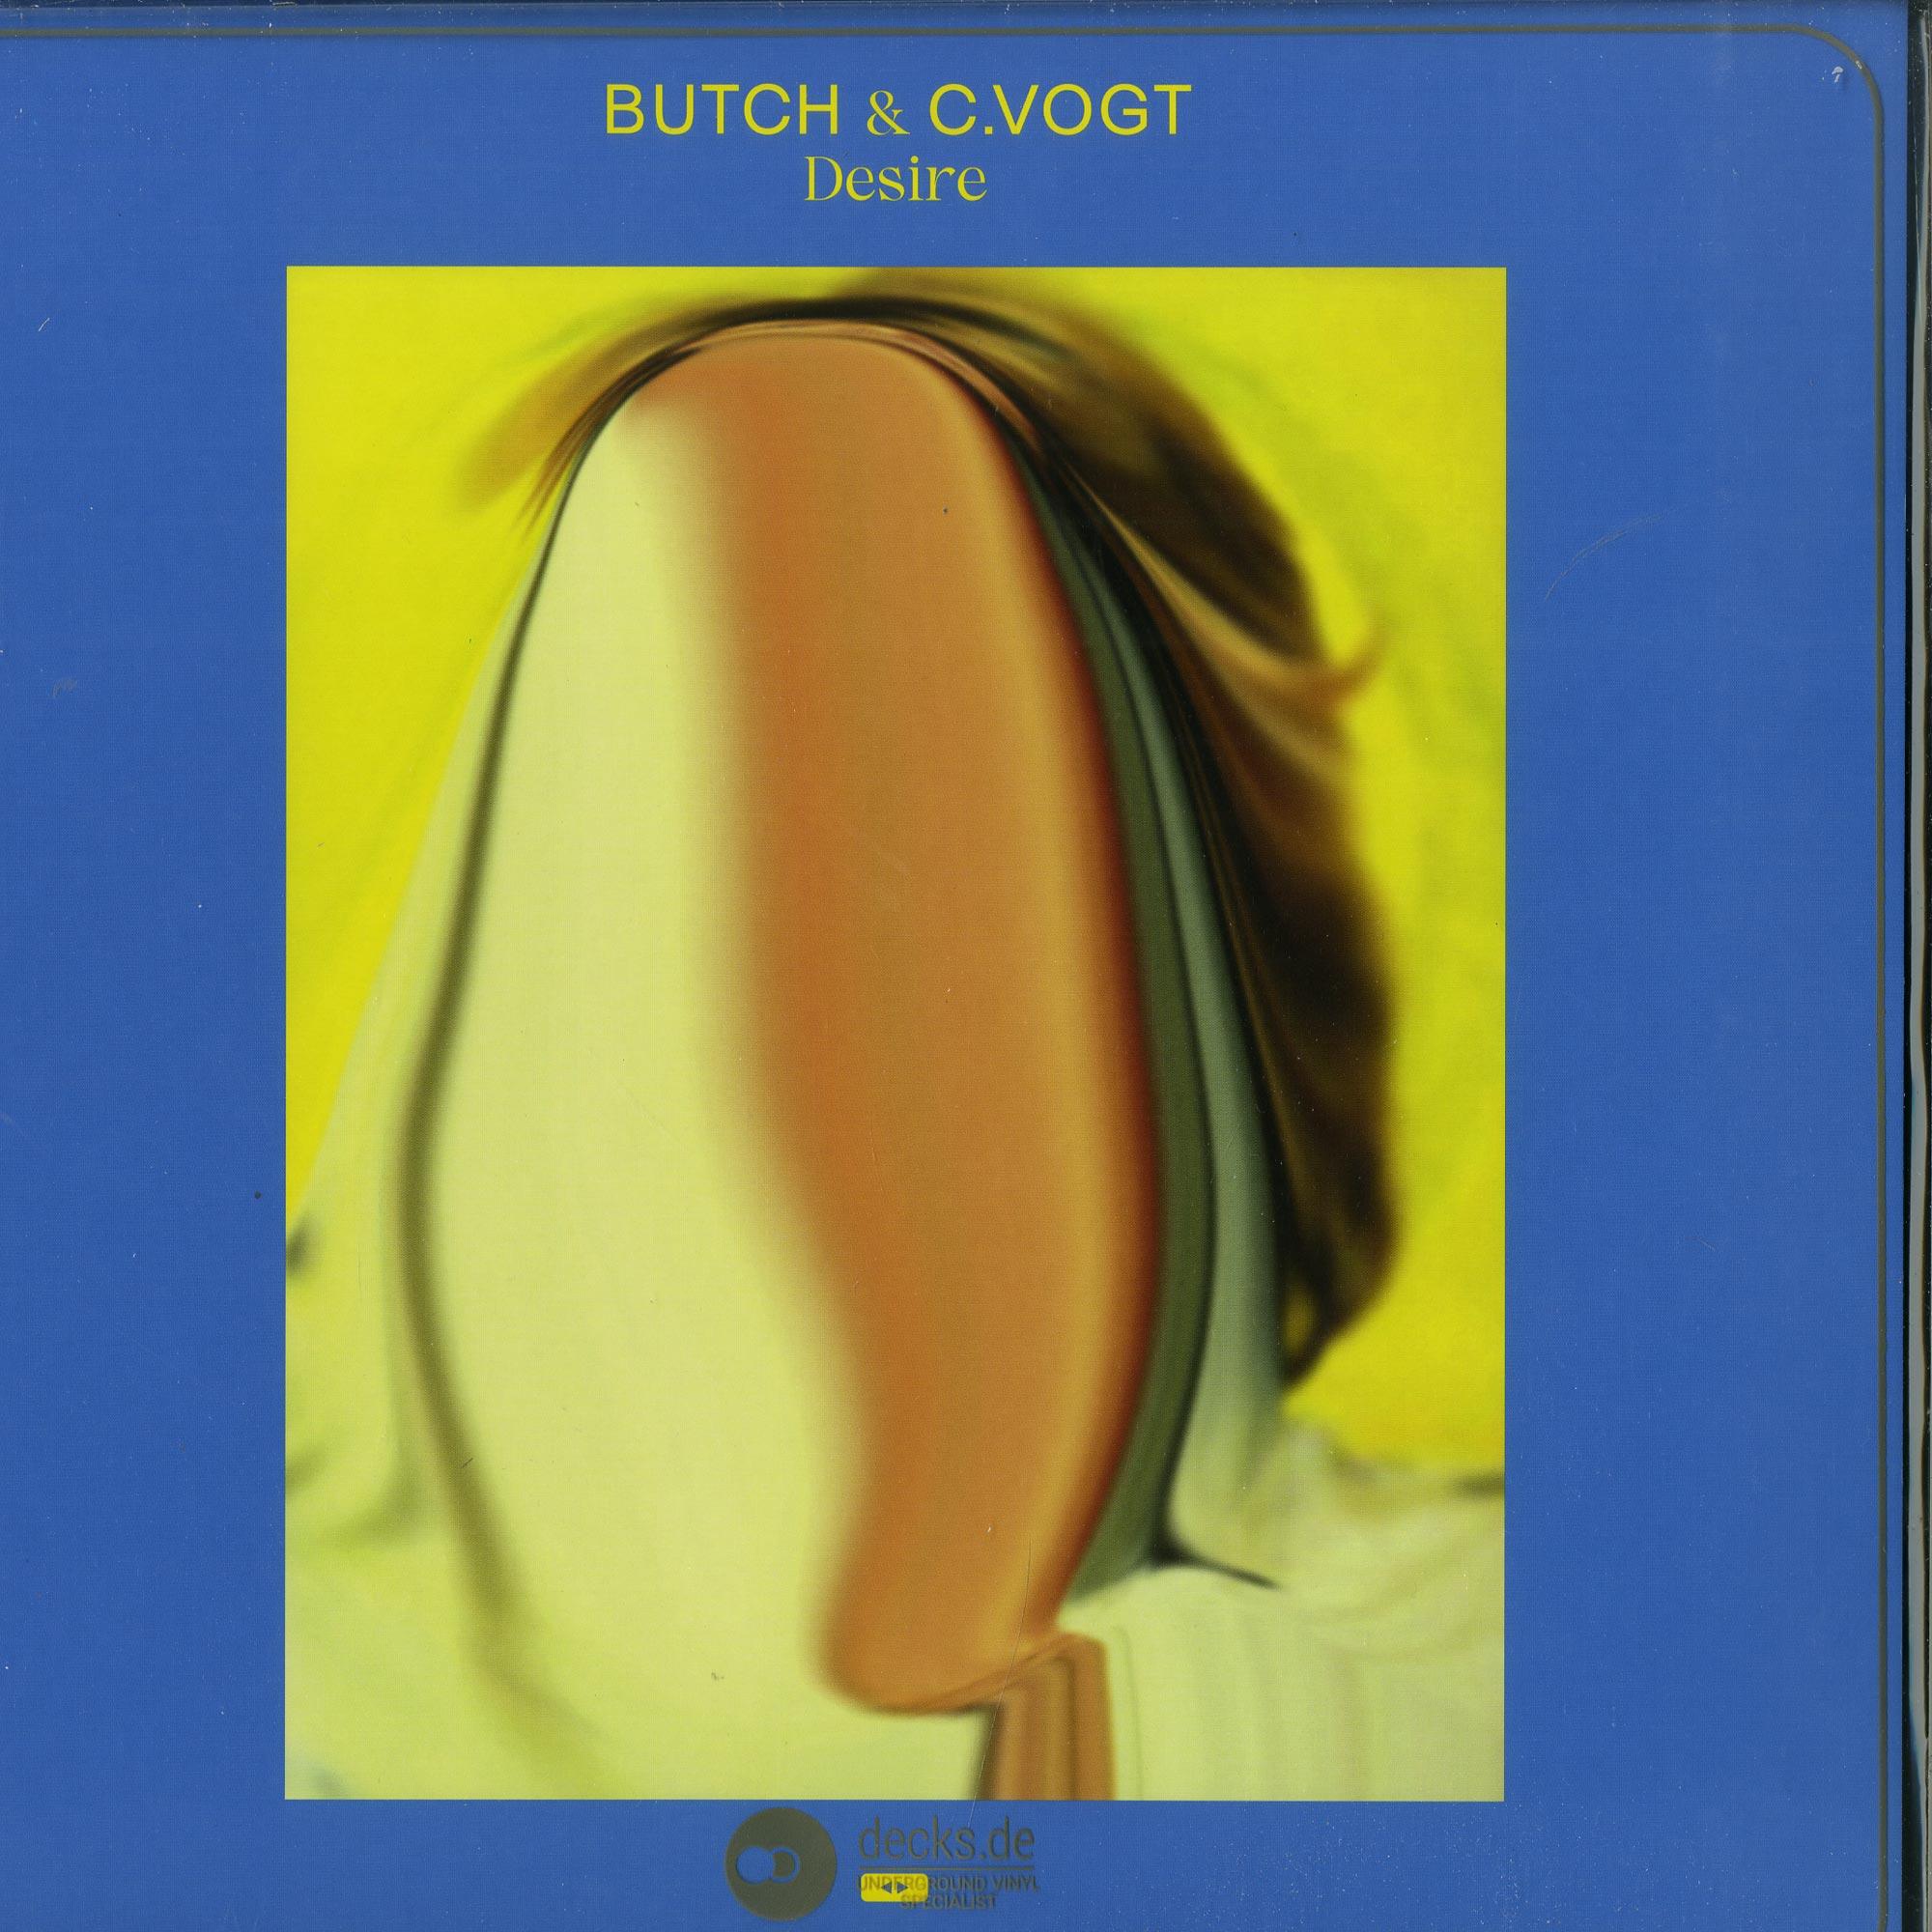 Butch & C. Vogt - DESIRE